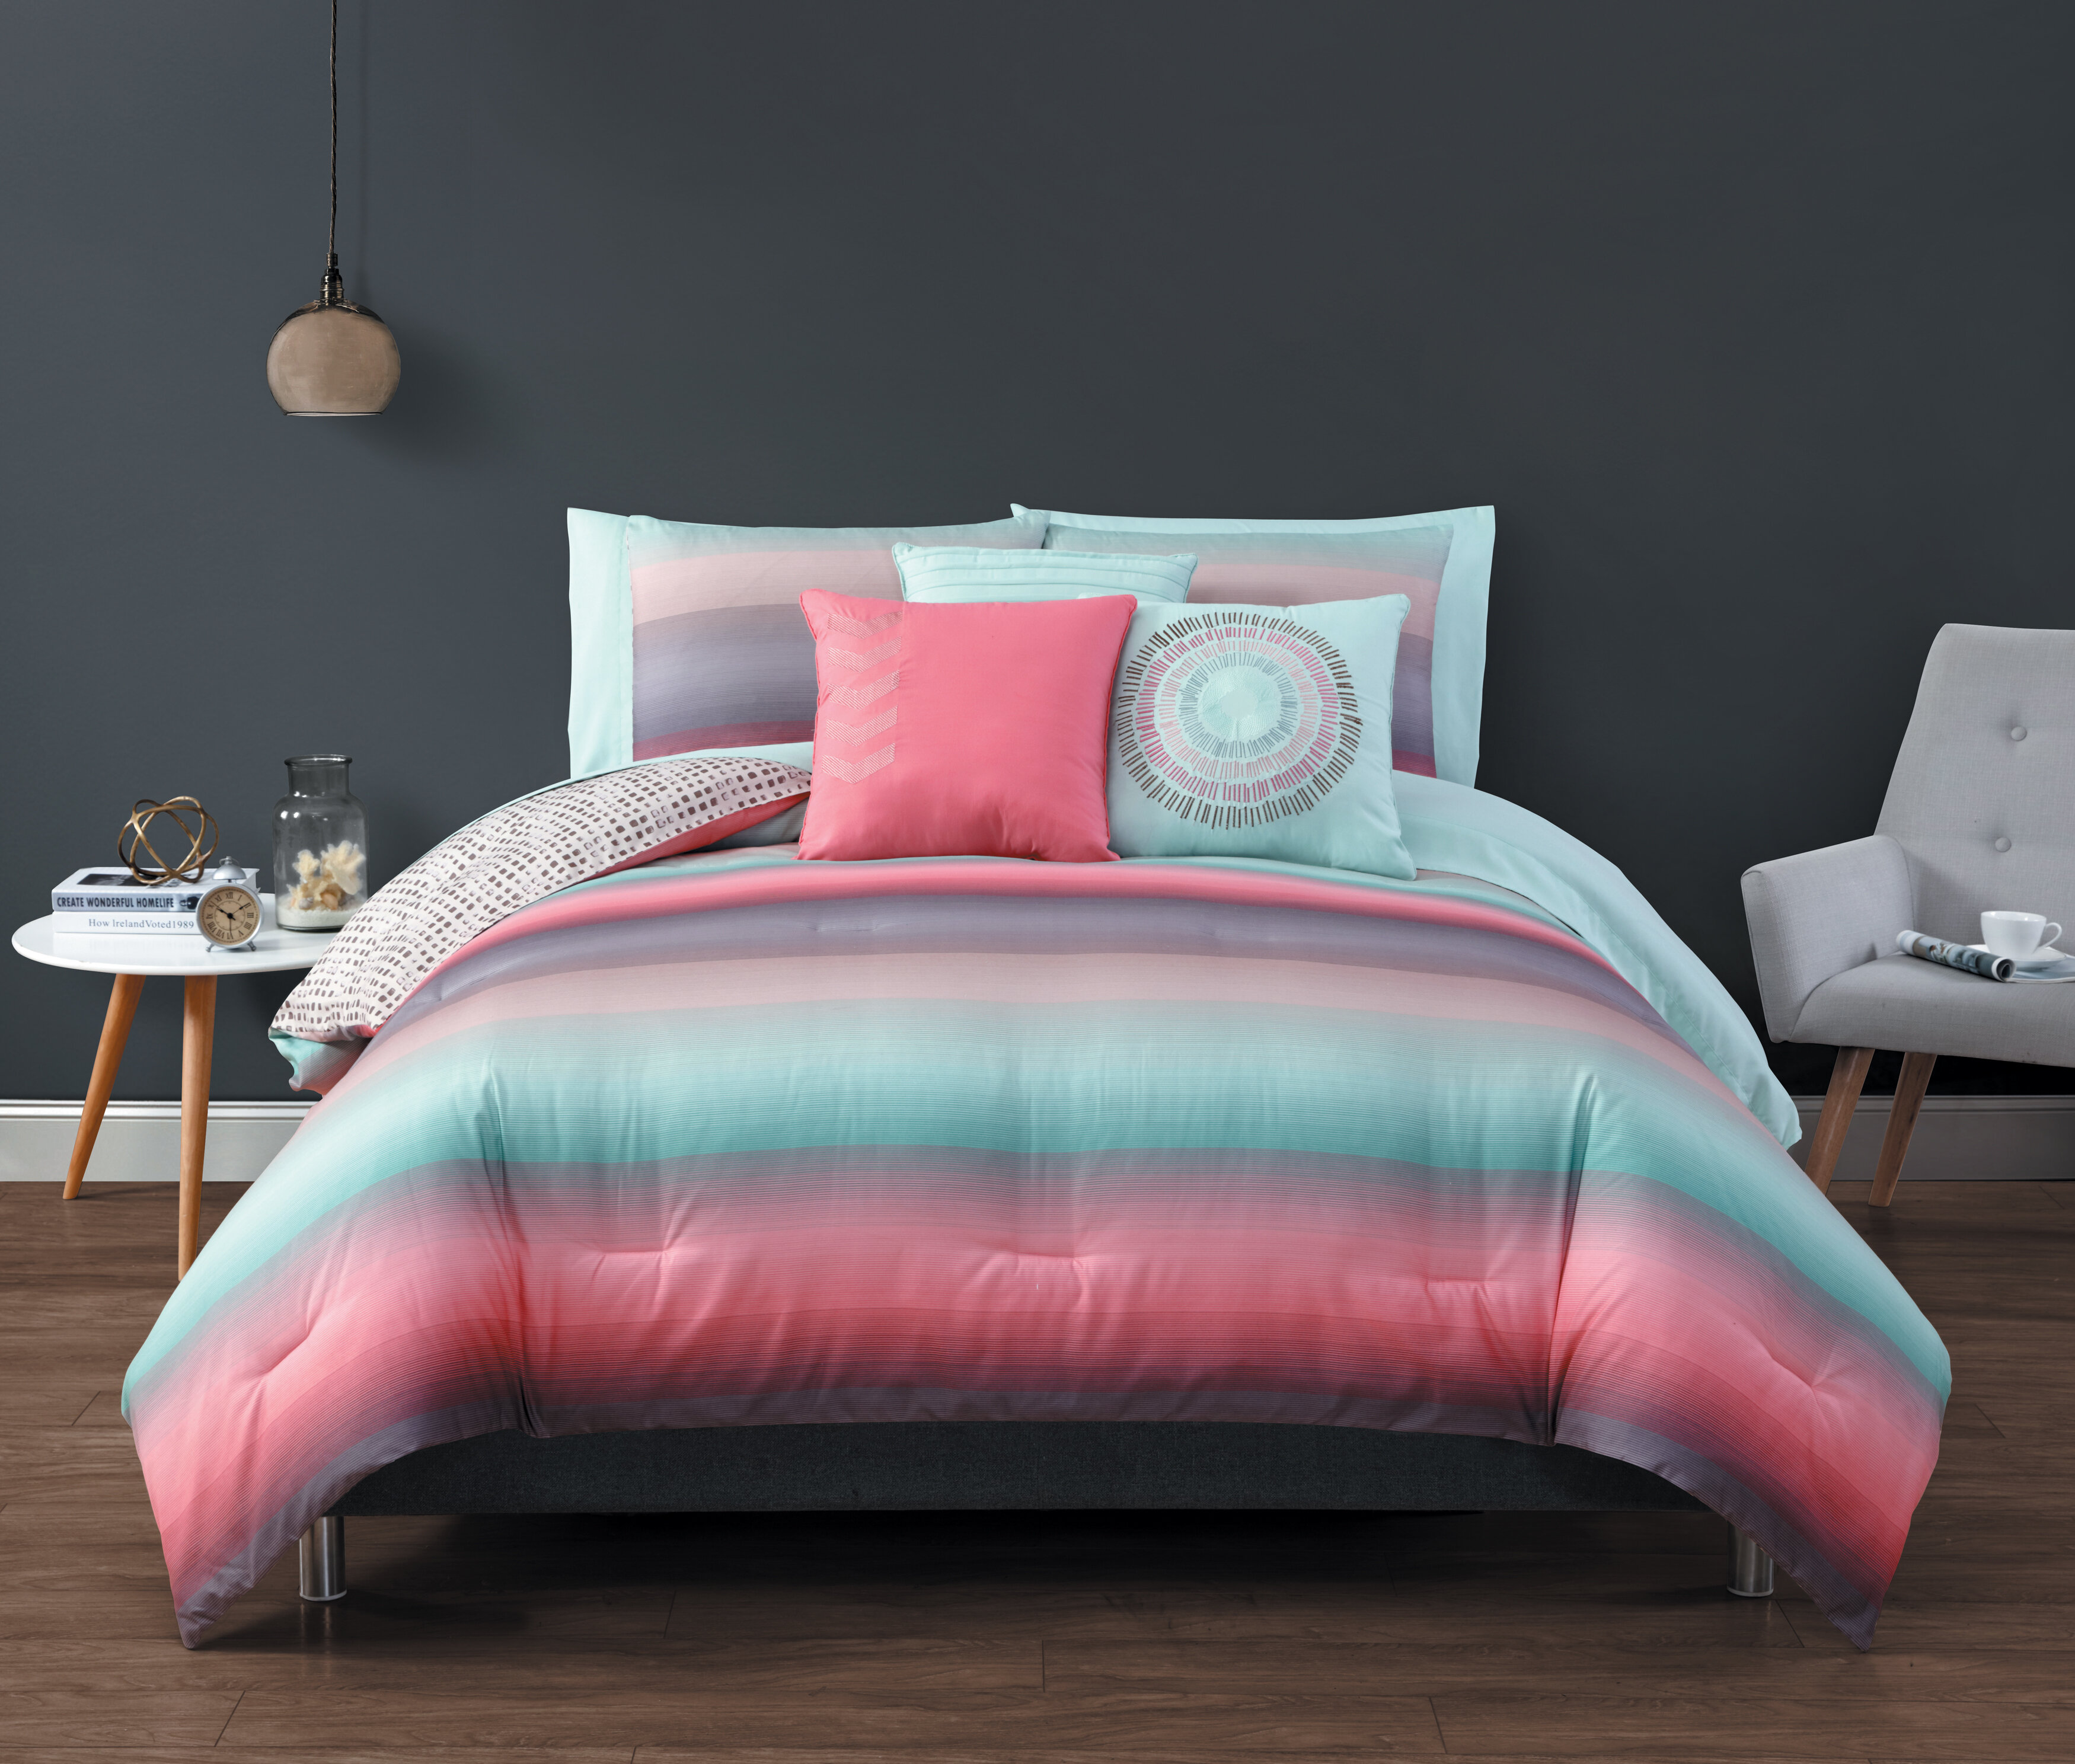 Dakota Fields Linolakes Reversible Comforter Set Reviews Wayfair